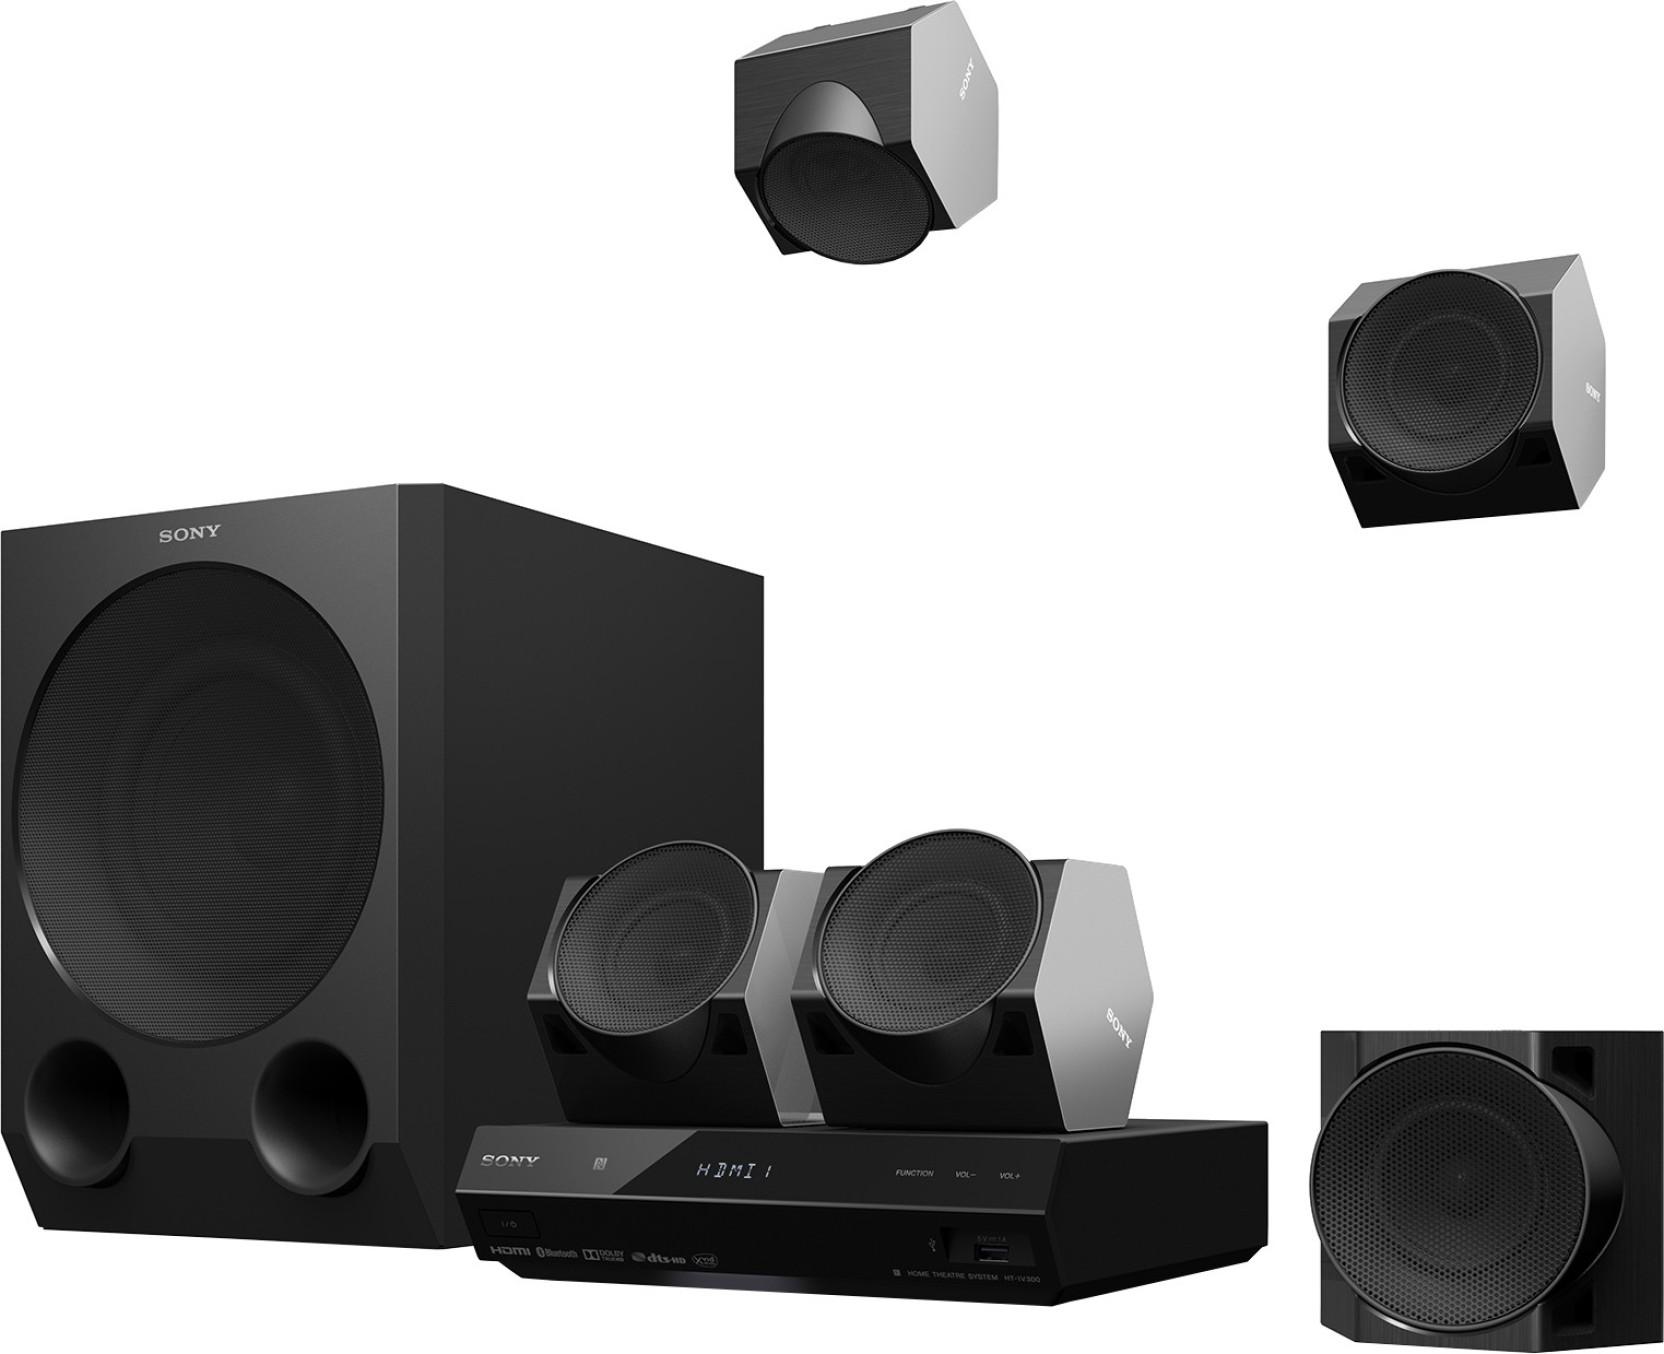 sony digital audio video control center instructions